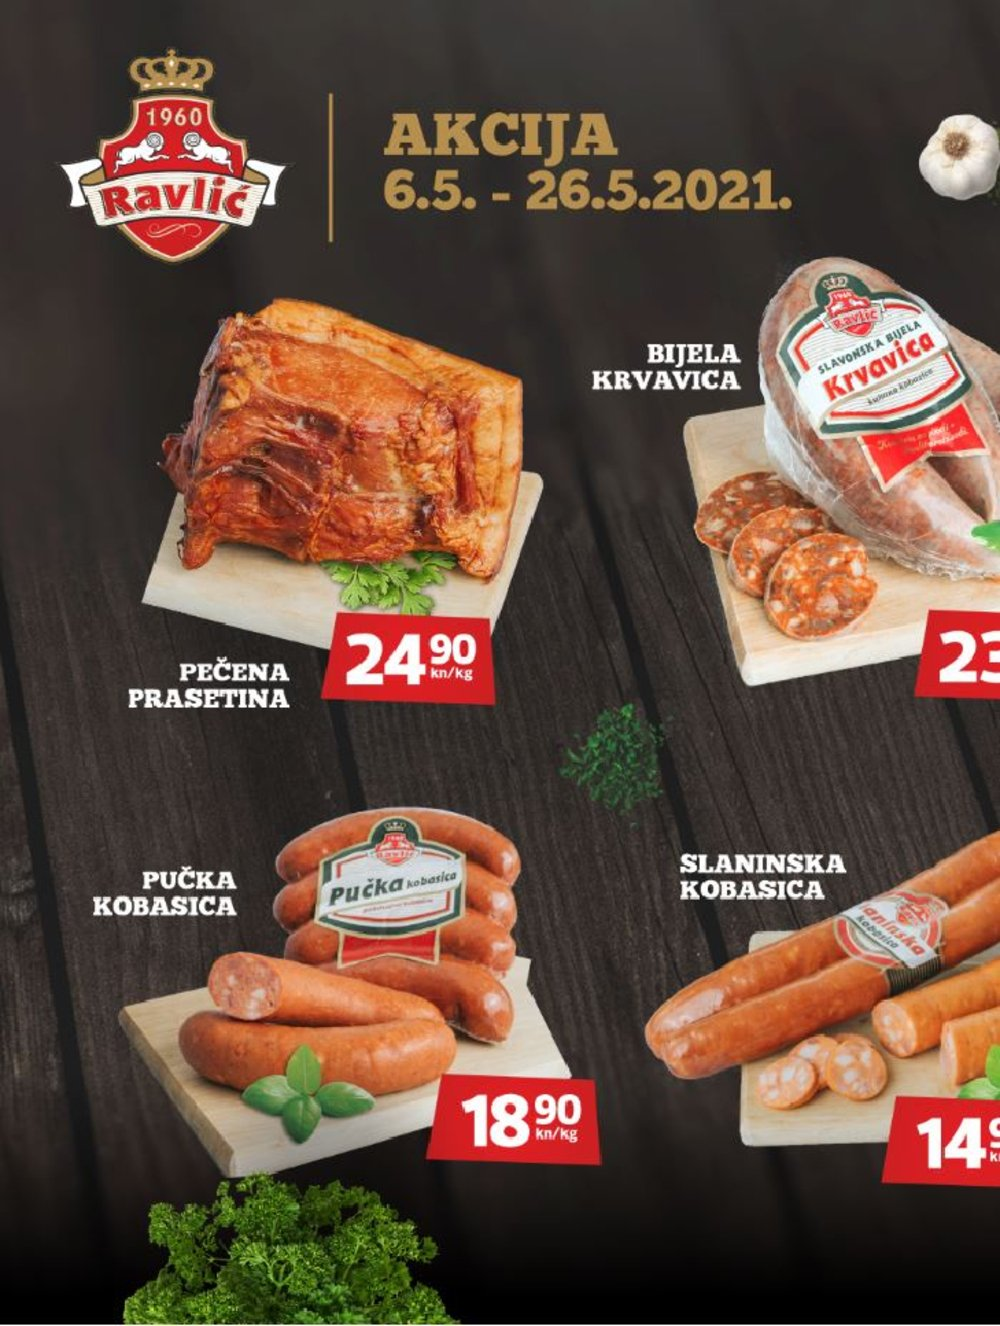 Ravlić katalog Akcija 06.05.-26.05.2021.